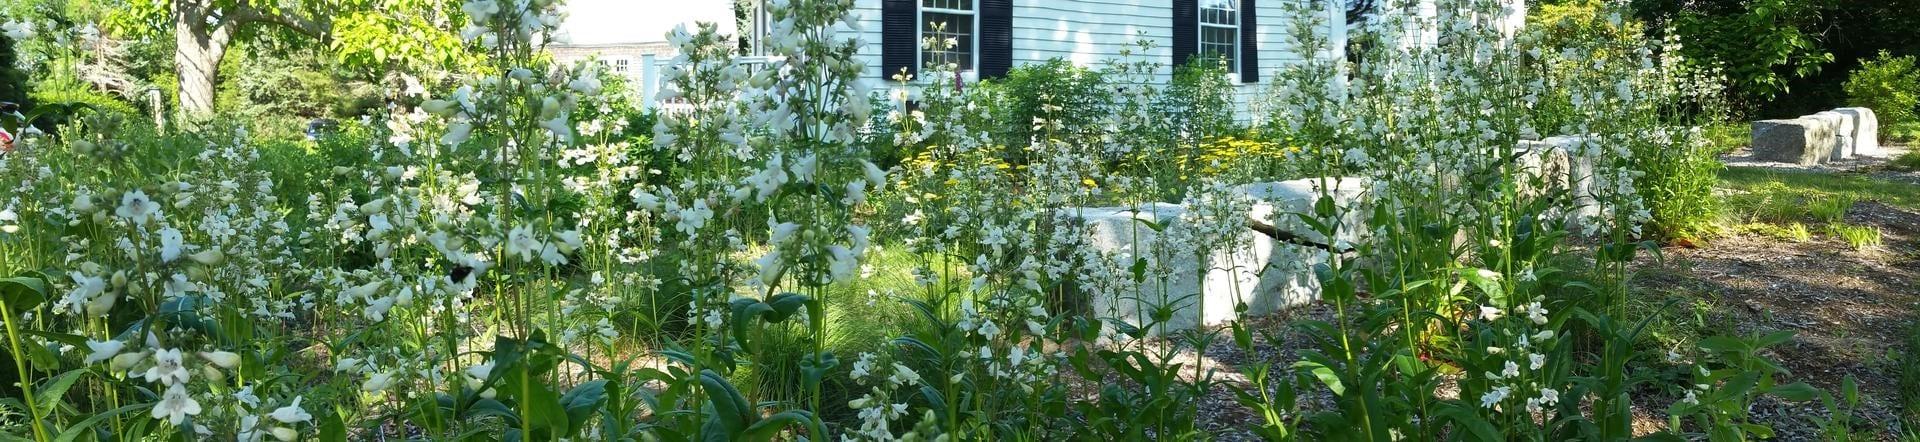 Celebrating Natives Garden Tour – Dennis, MA